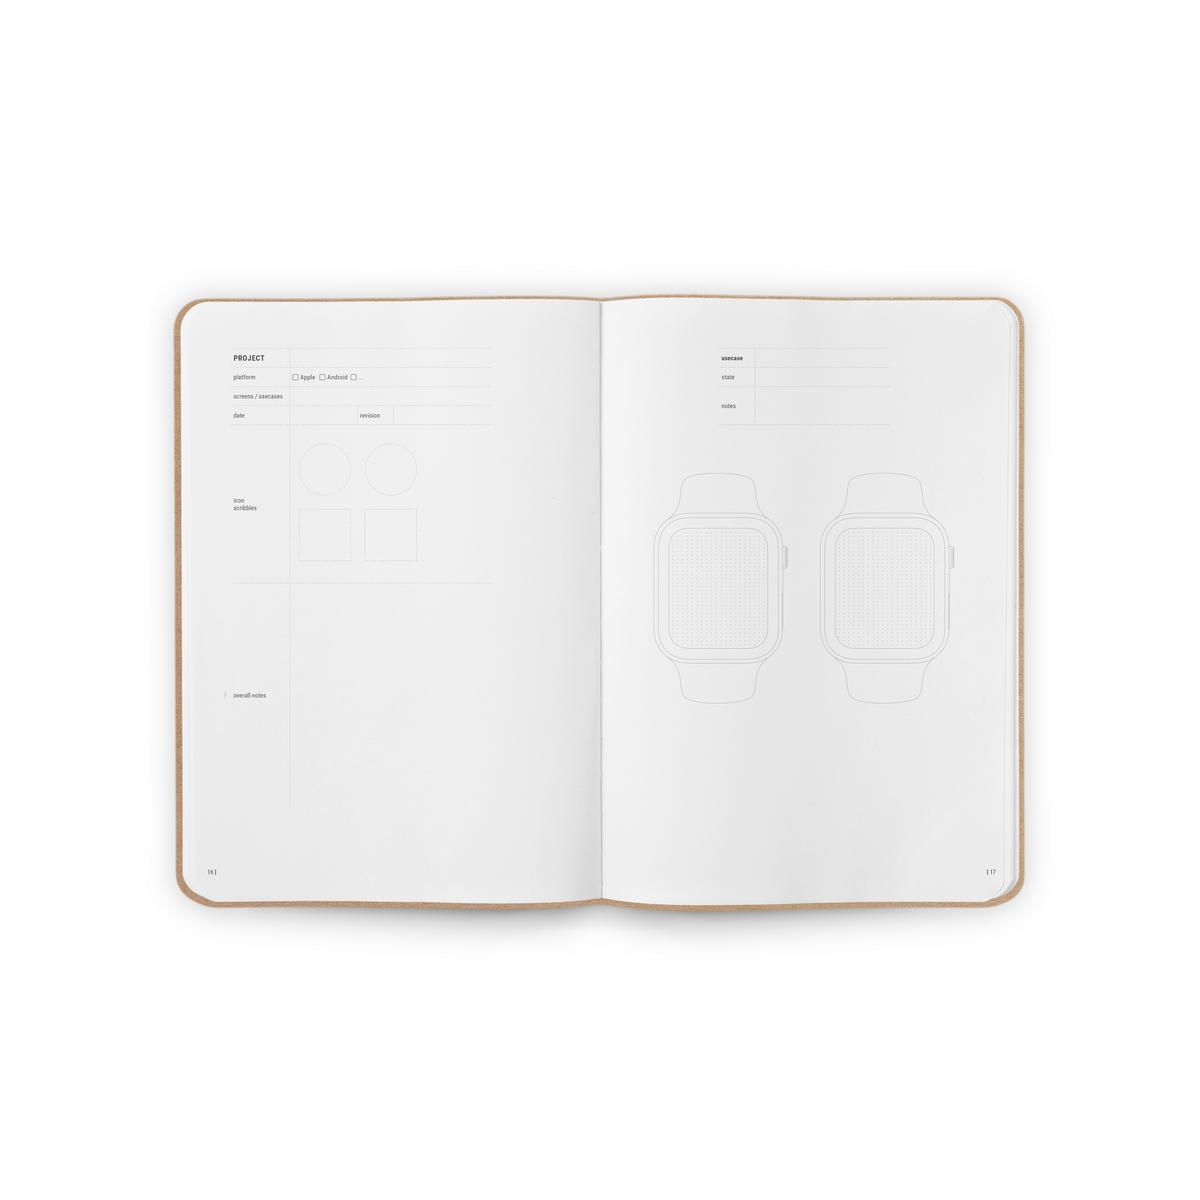 B-115_App-Mockup-Notebook_Stationery_Spread4